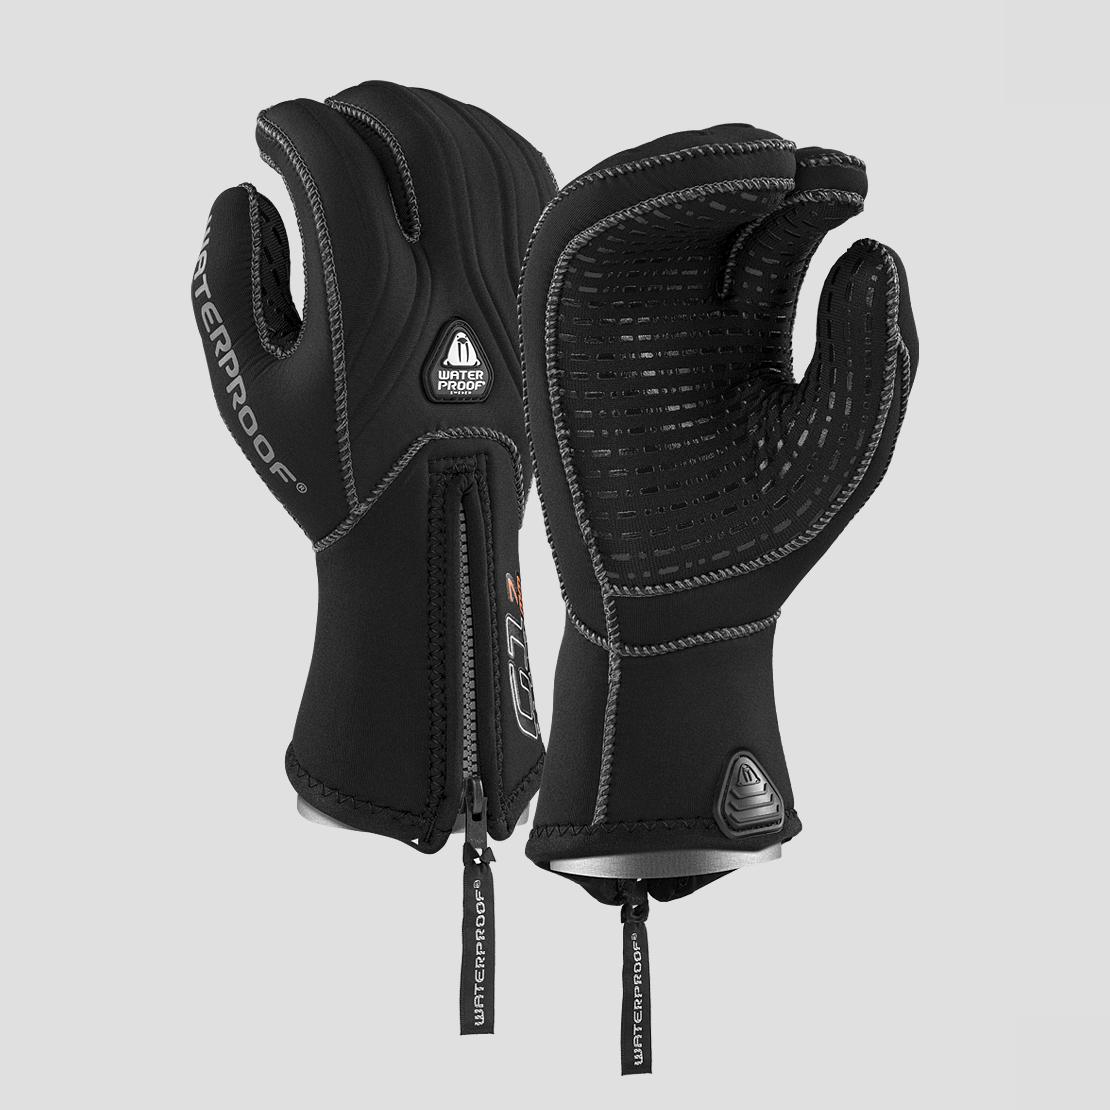 Waterproof G1 3-Fingerhandschuh 7mm Polar Evoluted